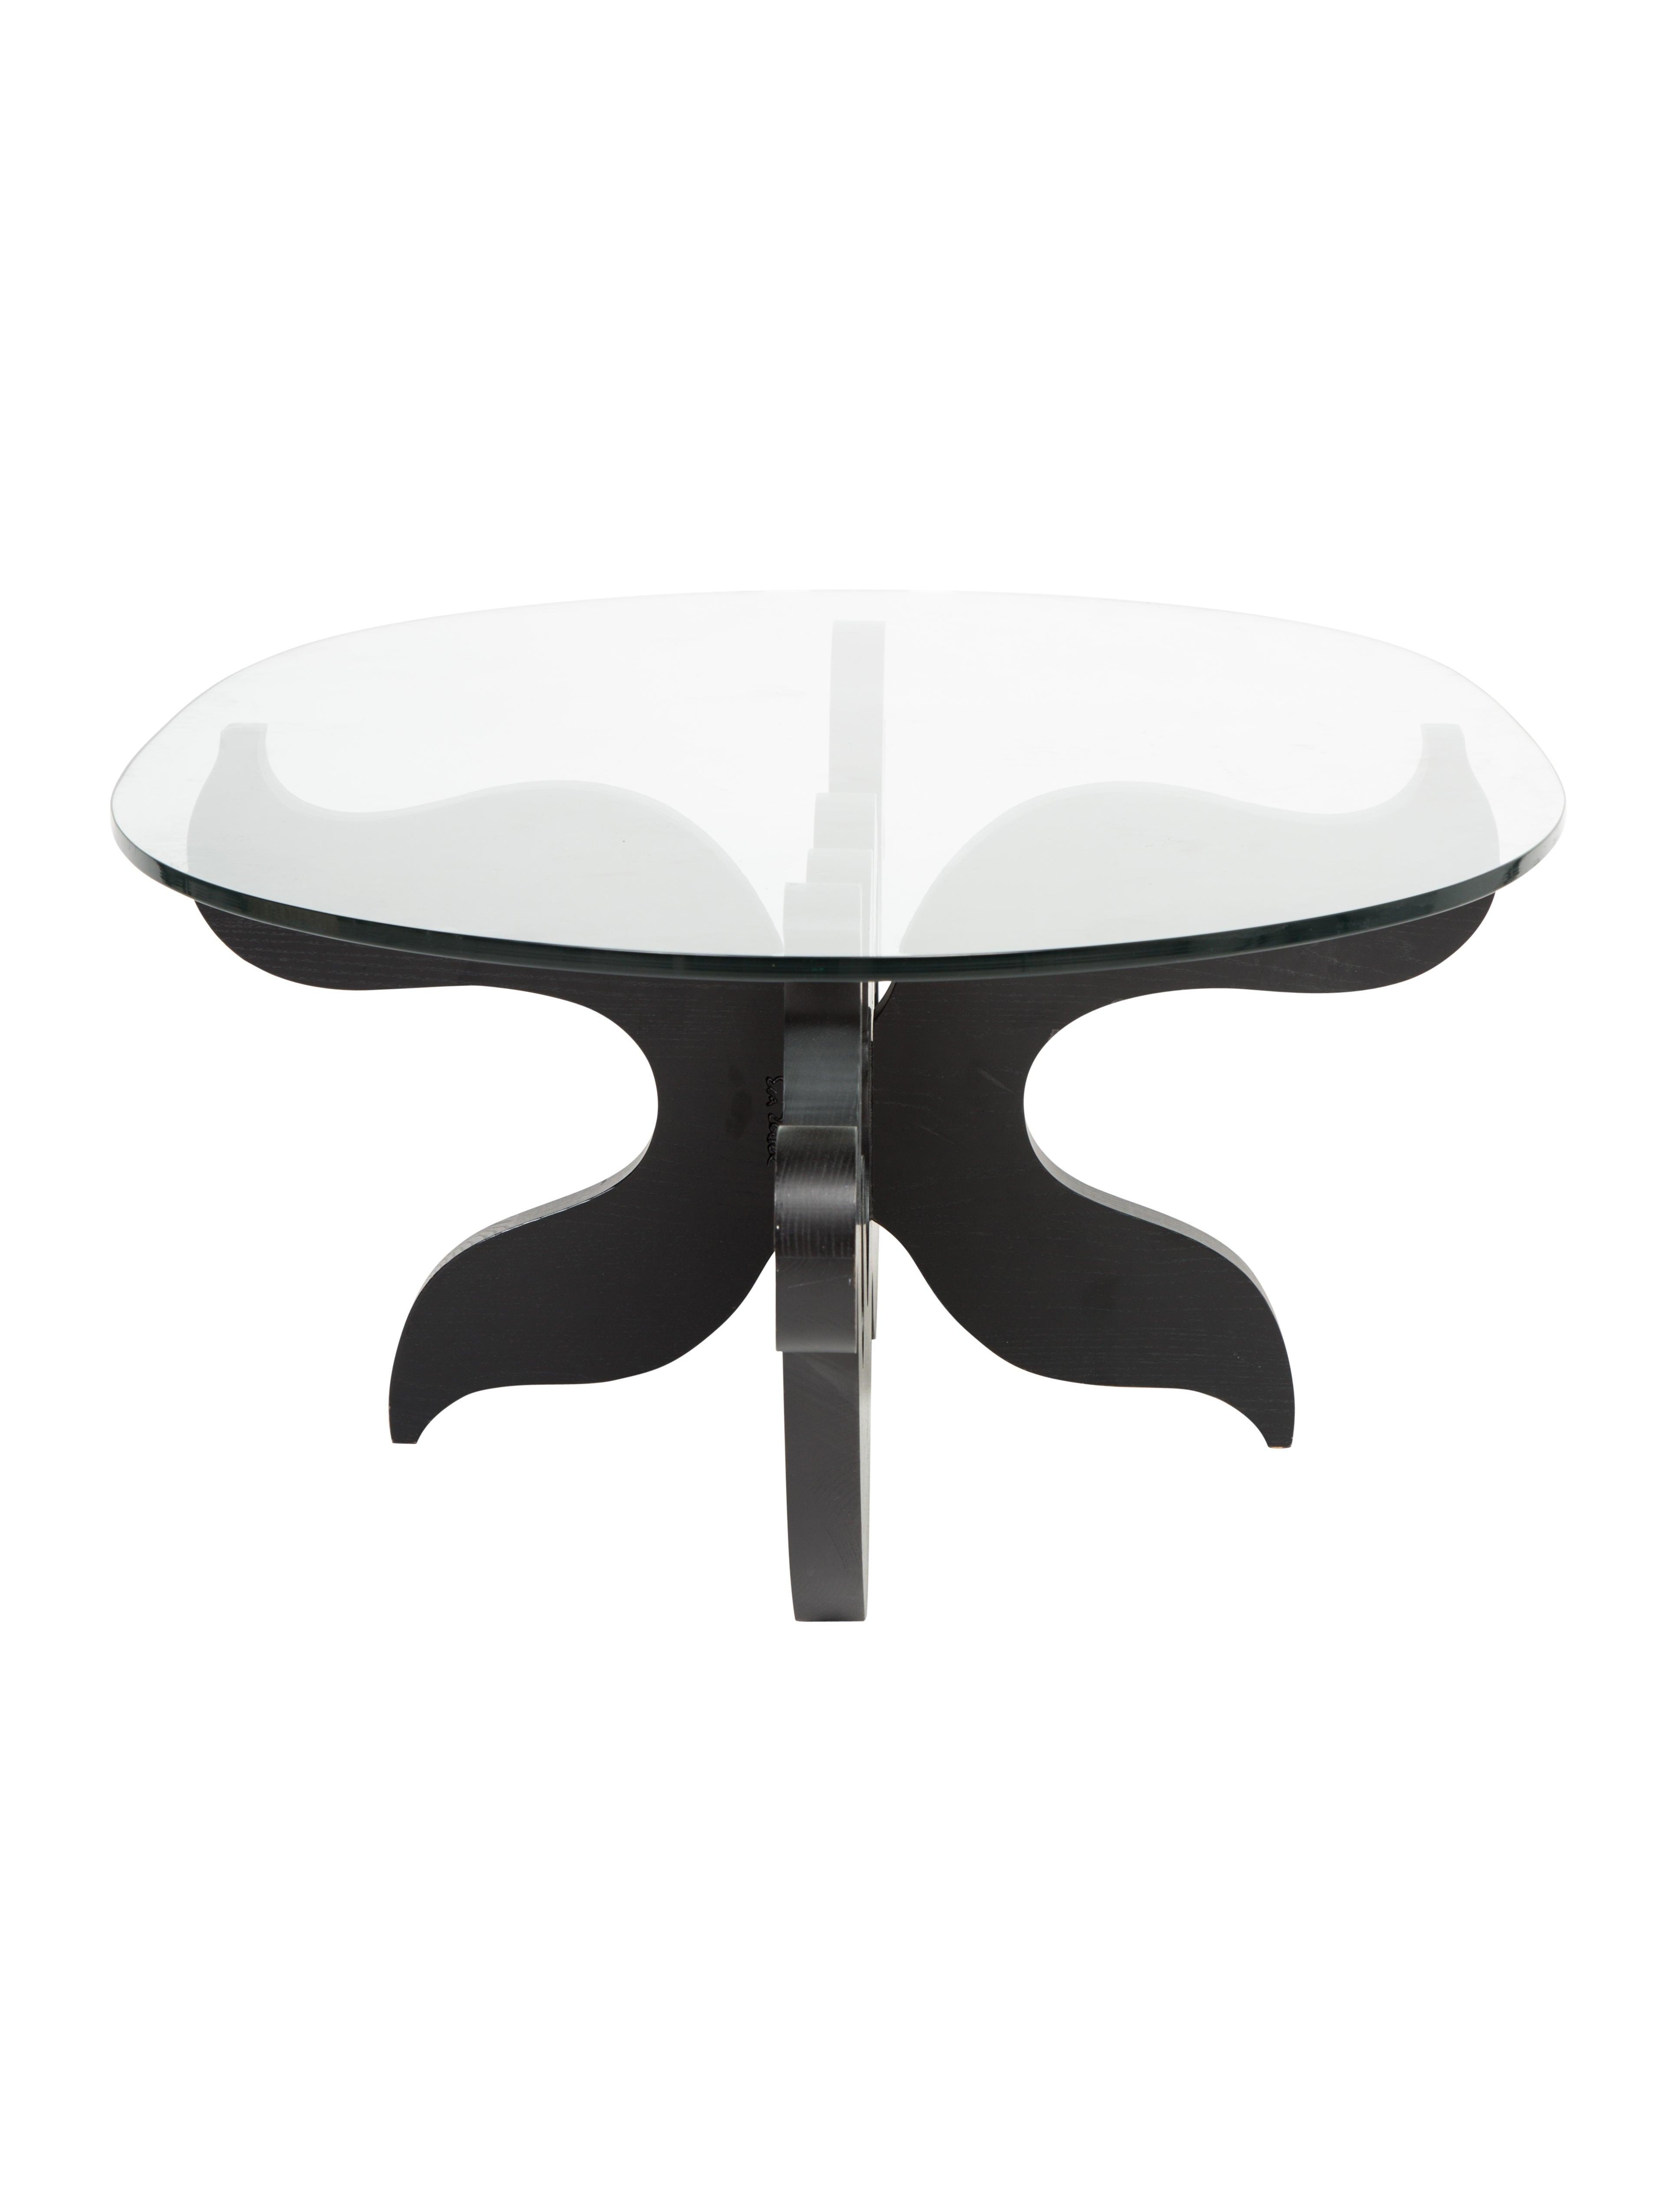 Design Within Reach Eva Zeisel Coffee Table Furniture DESWR20104